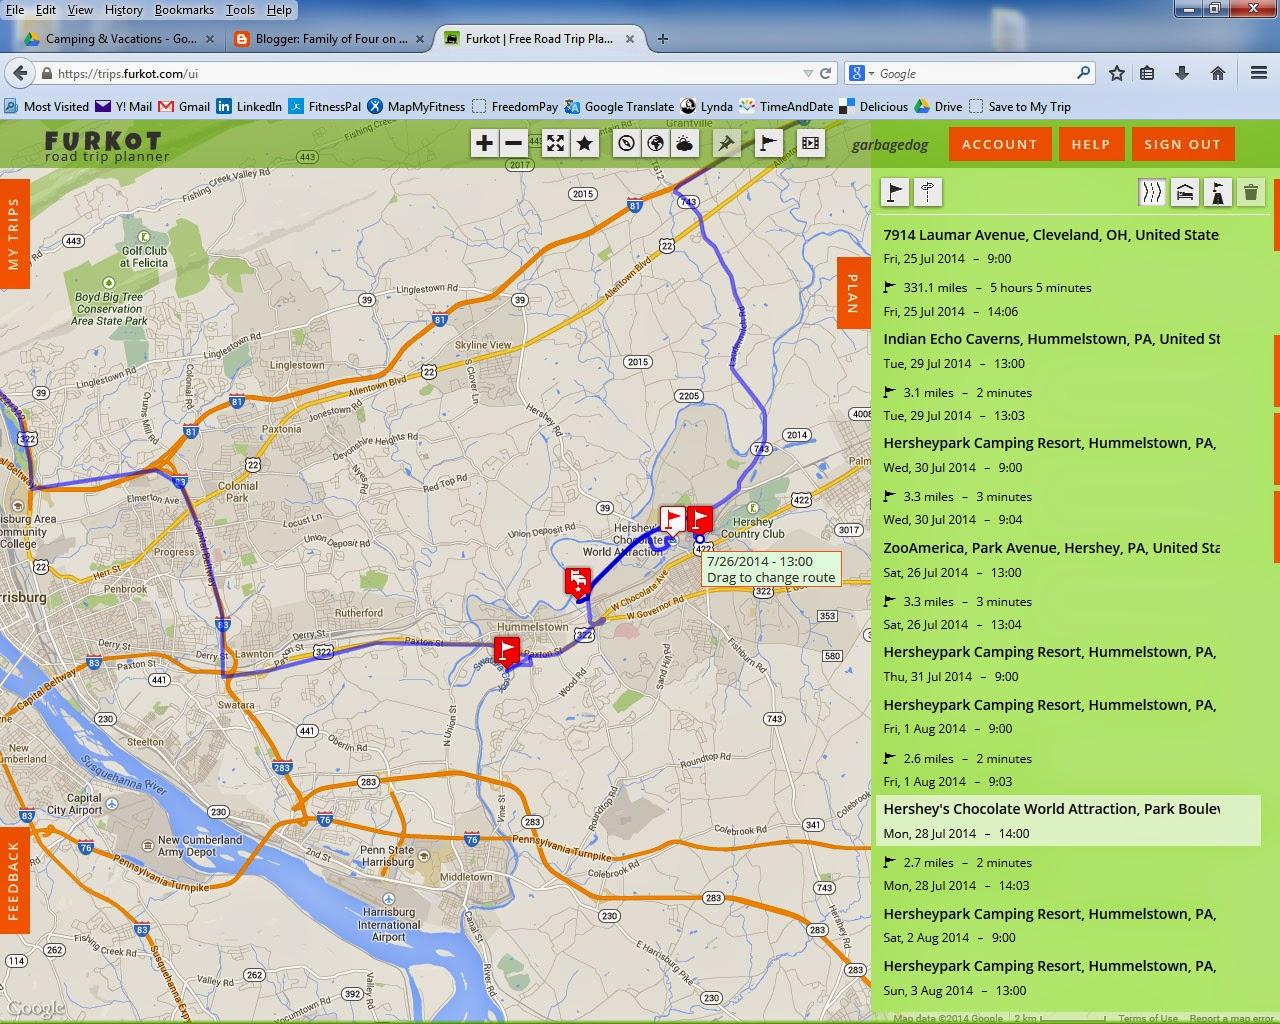 Business trip planner – World Travel Map Planner